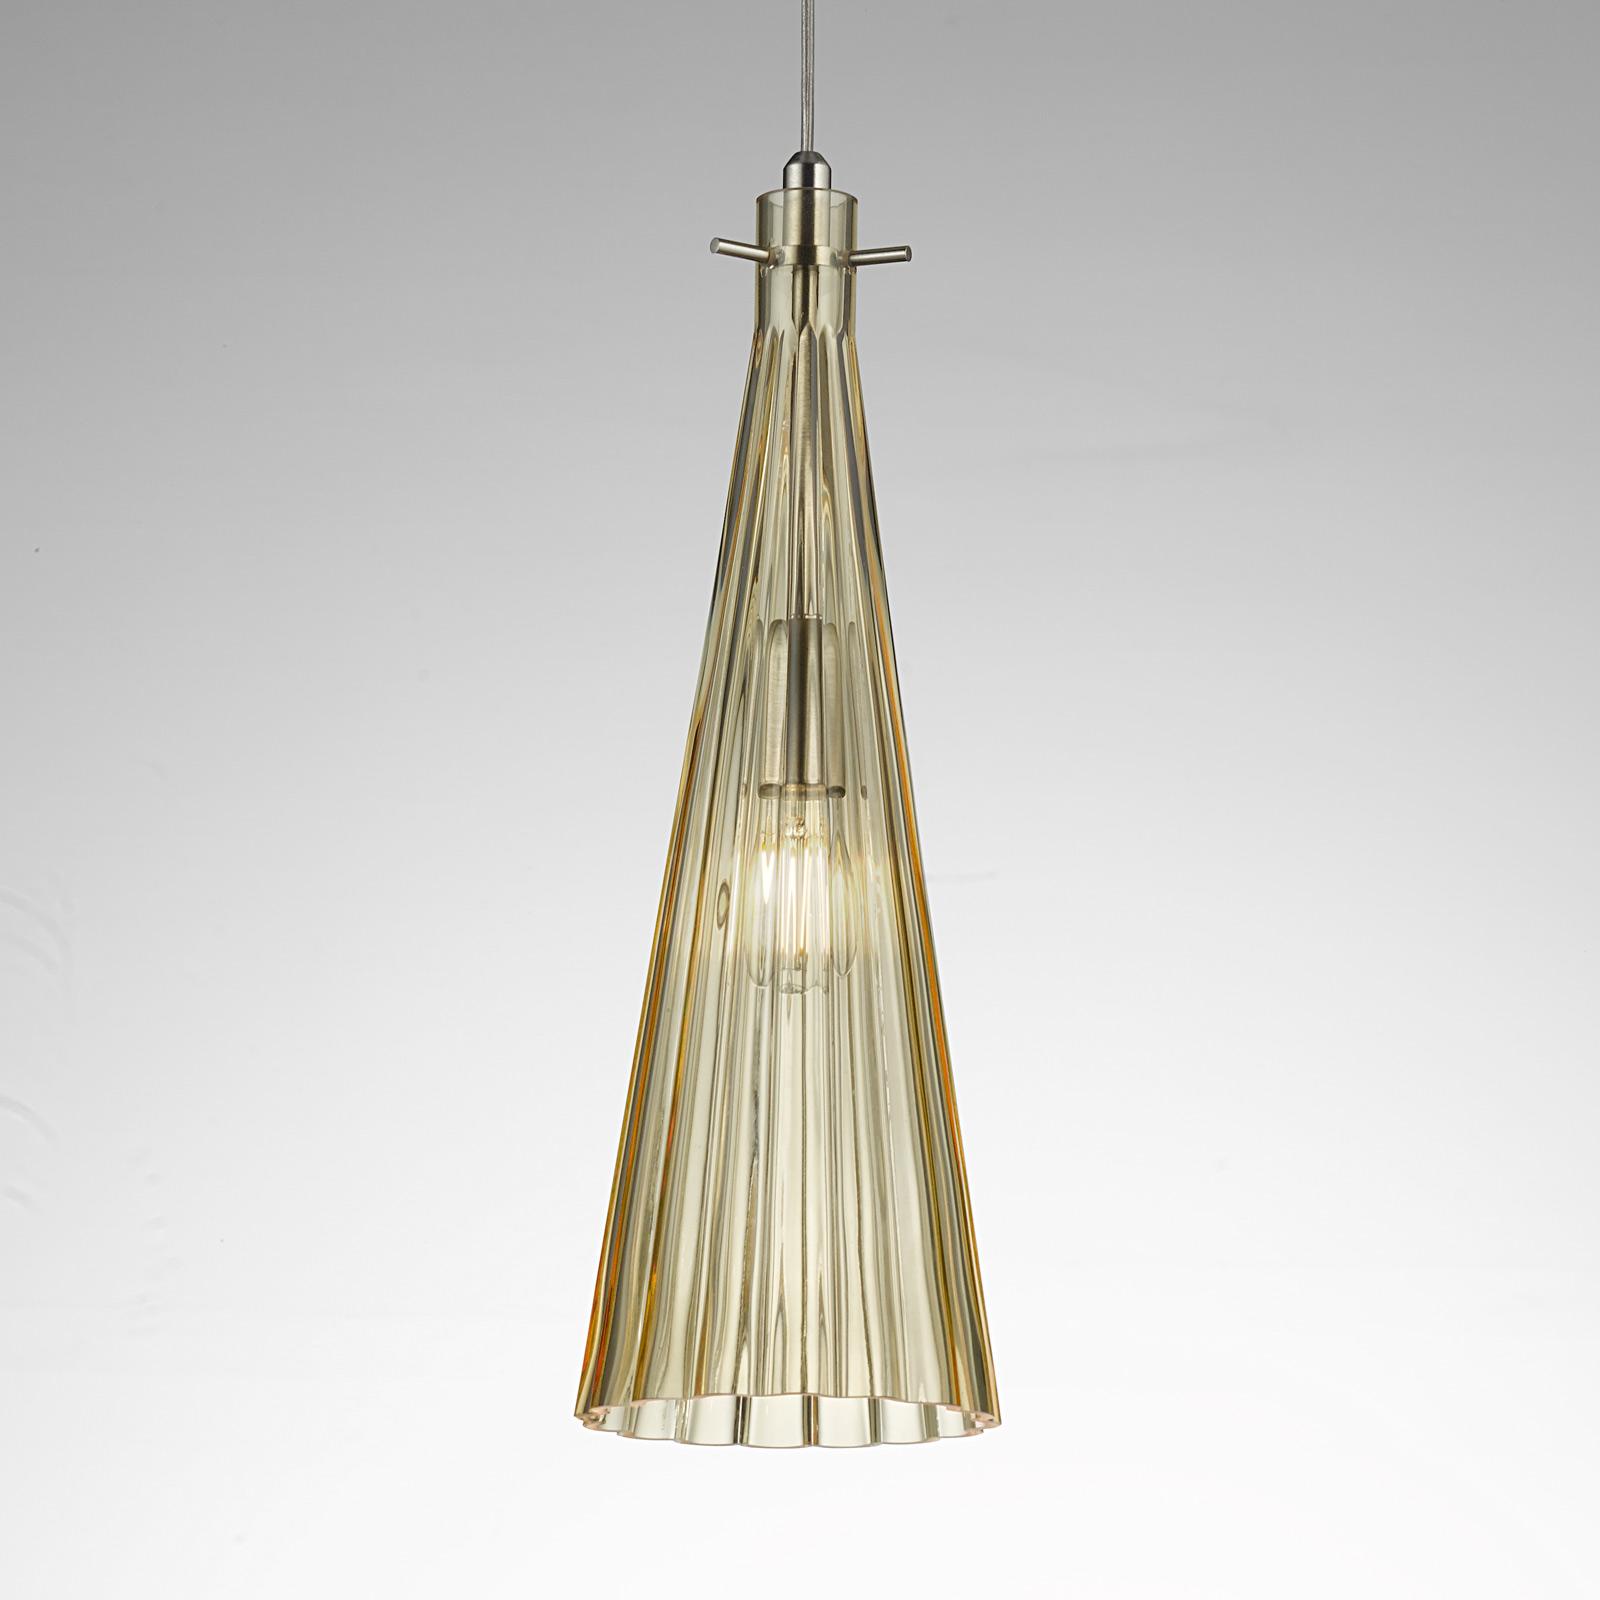 Hanglamp Costa Rica van glas, amber